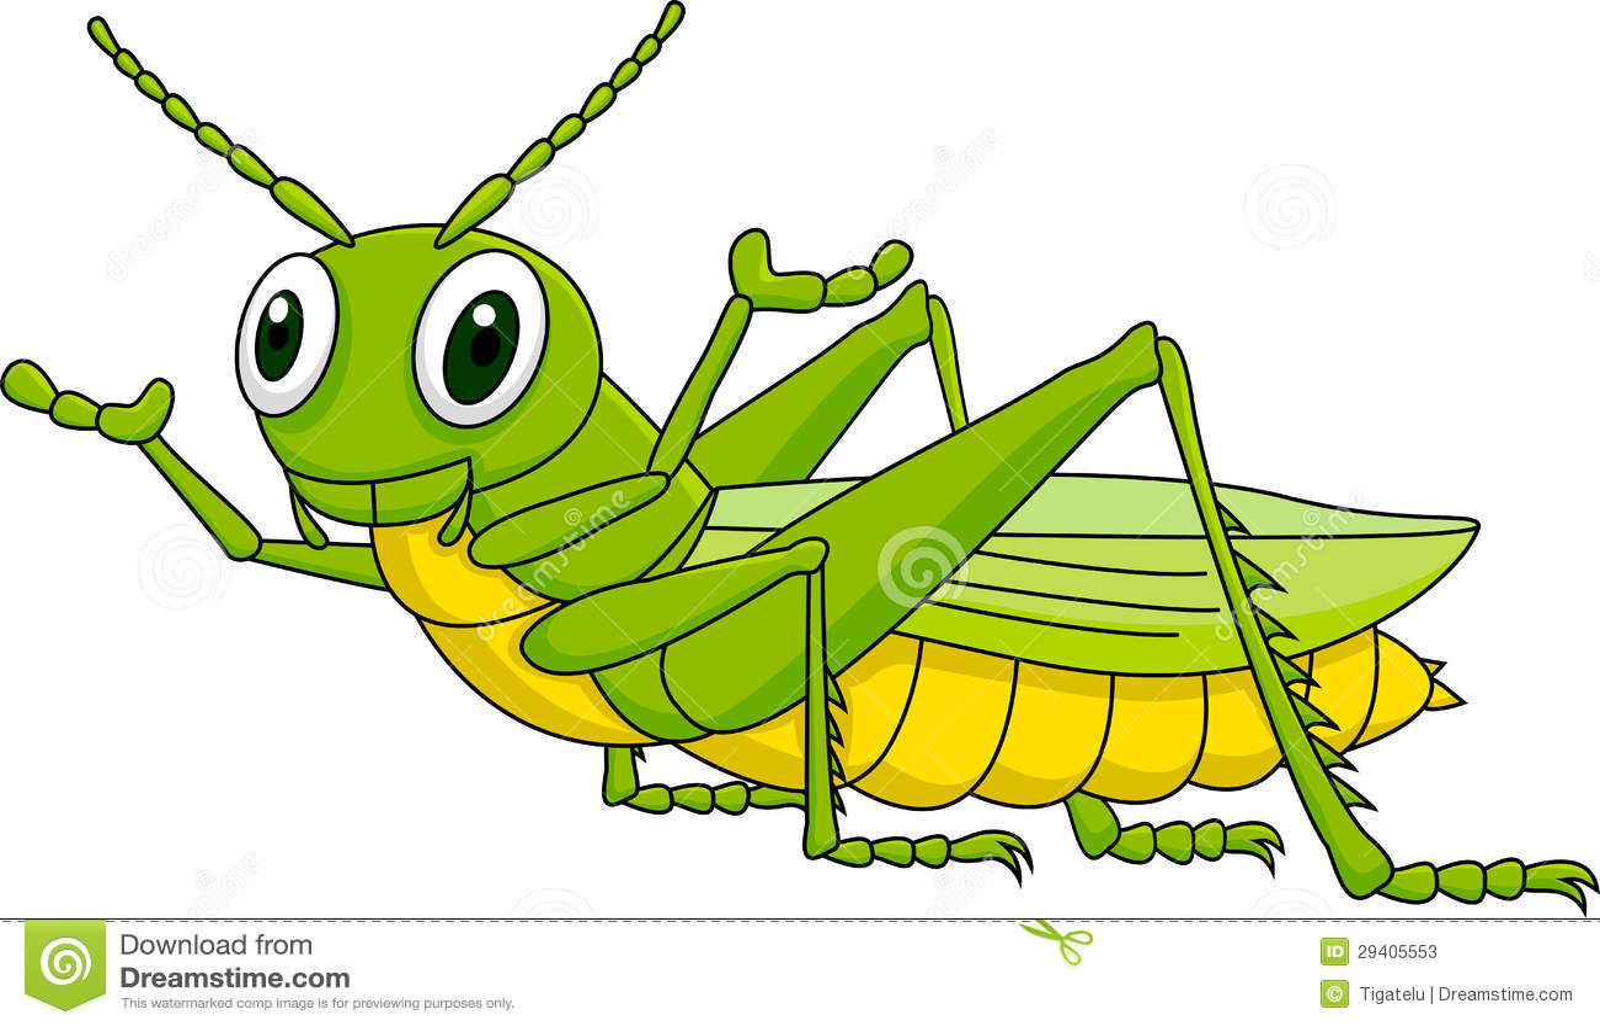 Green snake cartoon royalty free stock image image 19462406 - Desenhos Animados Do Gafanhoto Fotos De Stock